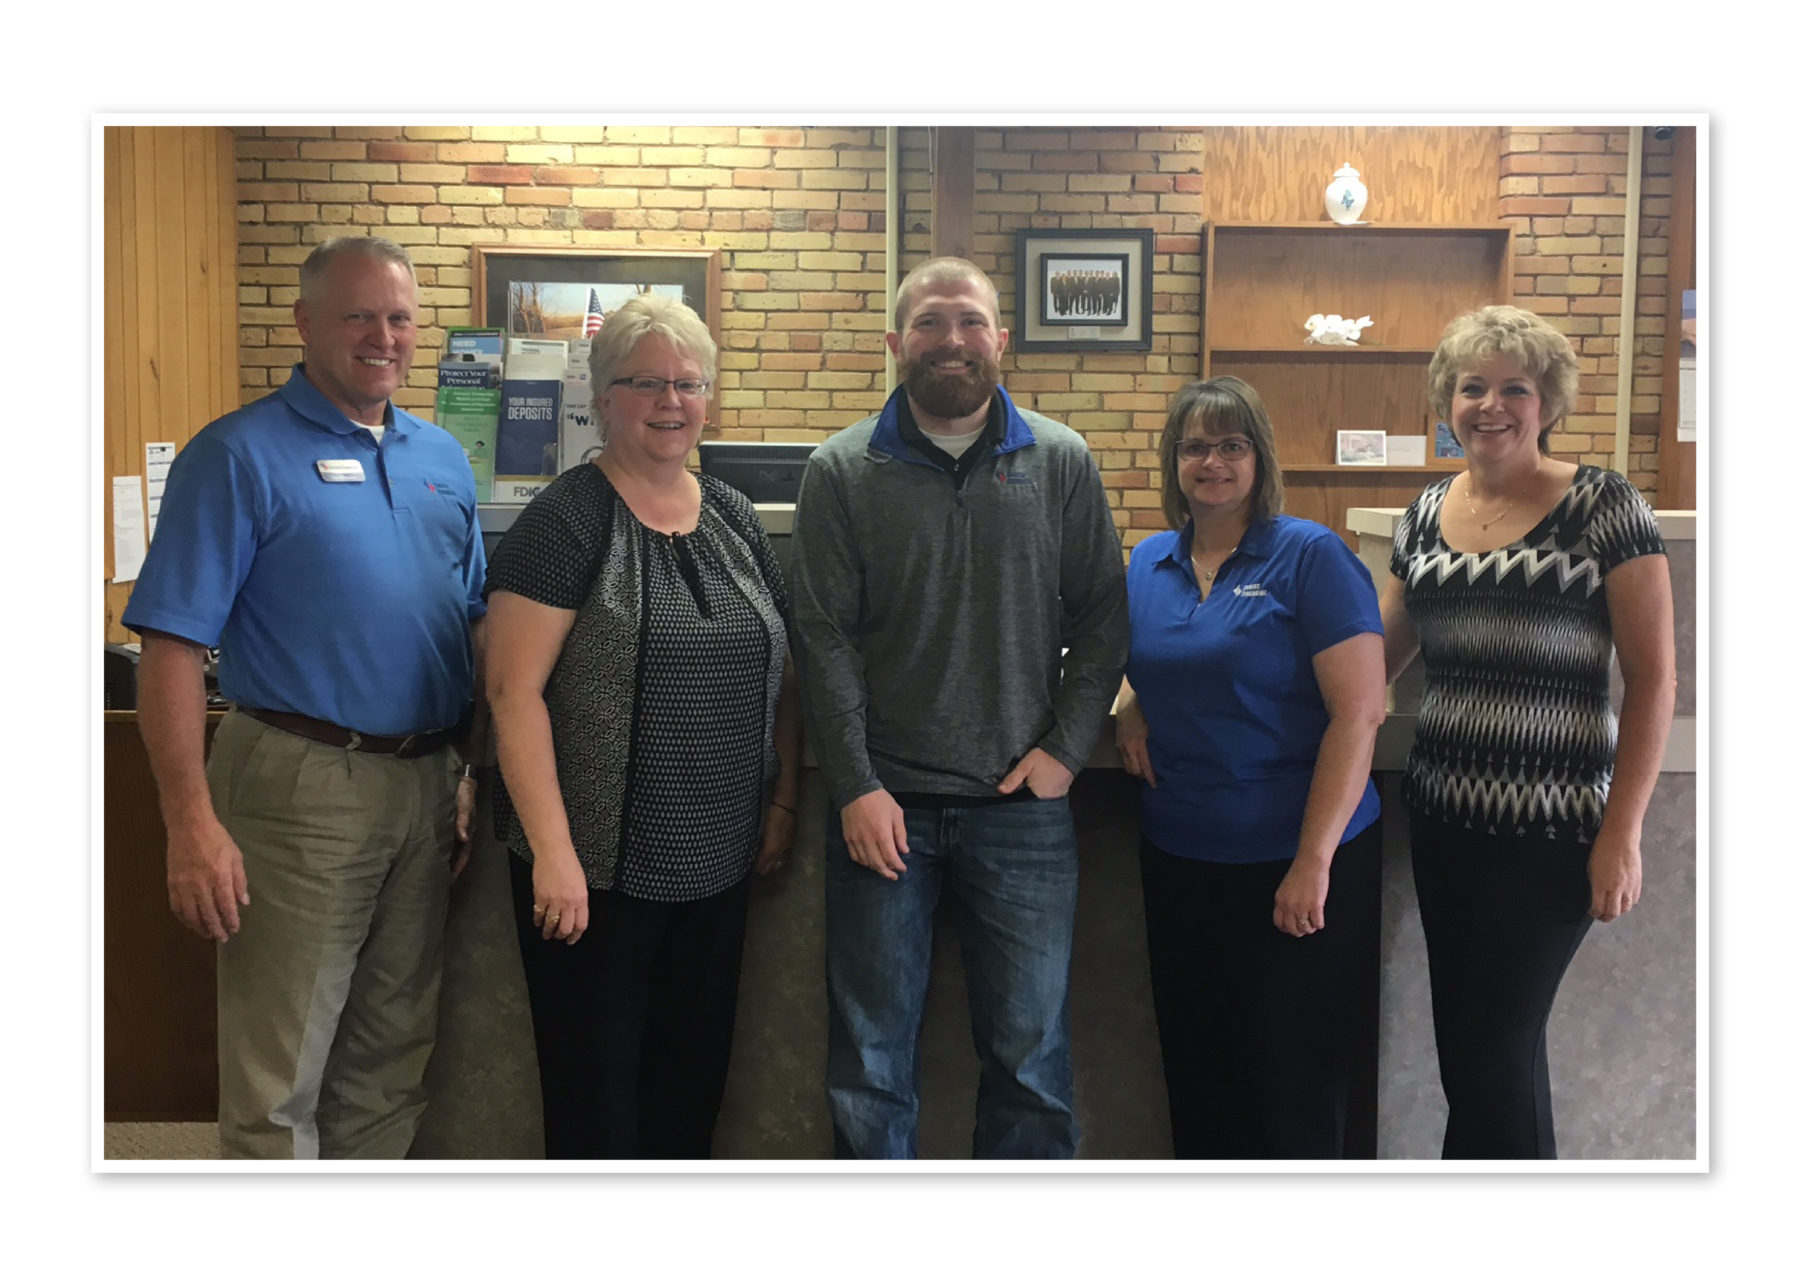 The team stands together in the Media bank. (Left to Right) Gerald Horner, Karen Schlecht, Todd Olson, Val Leier, Rhonda Schlecht